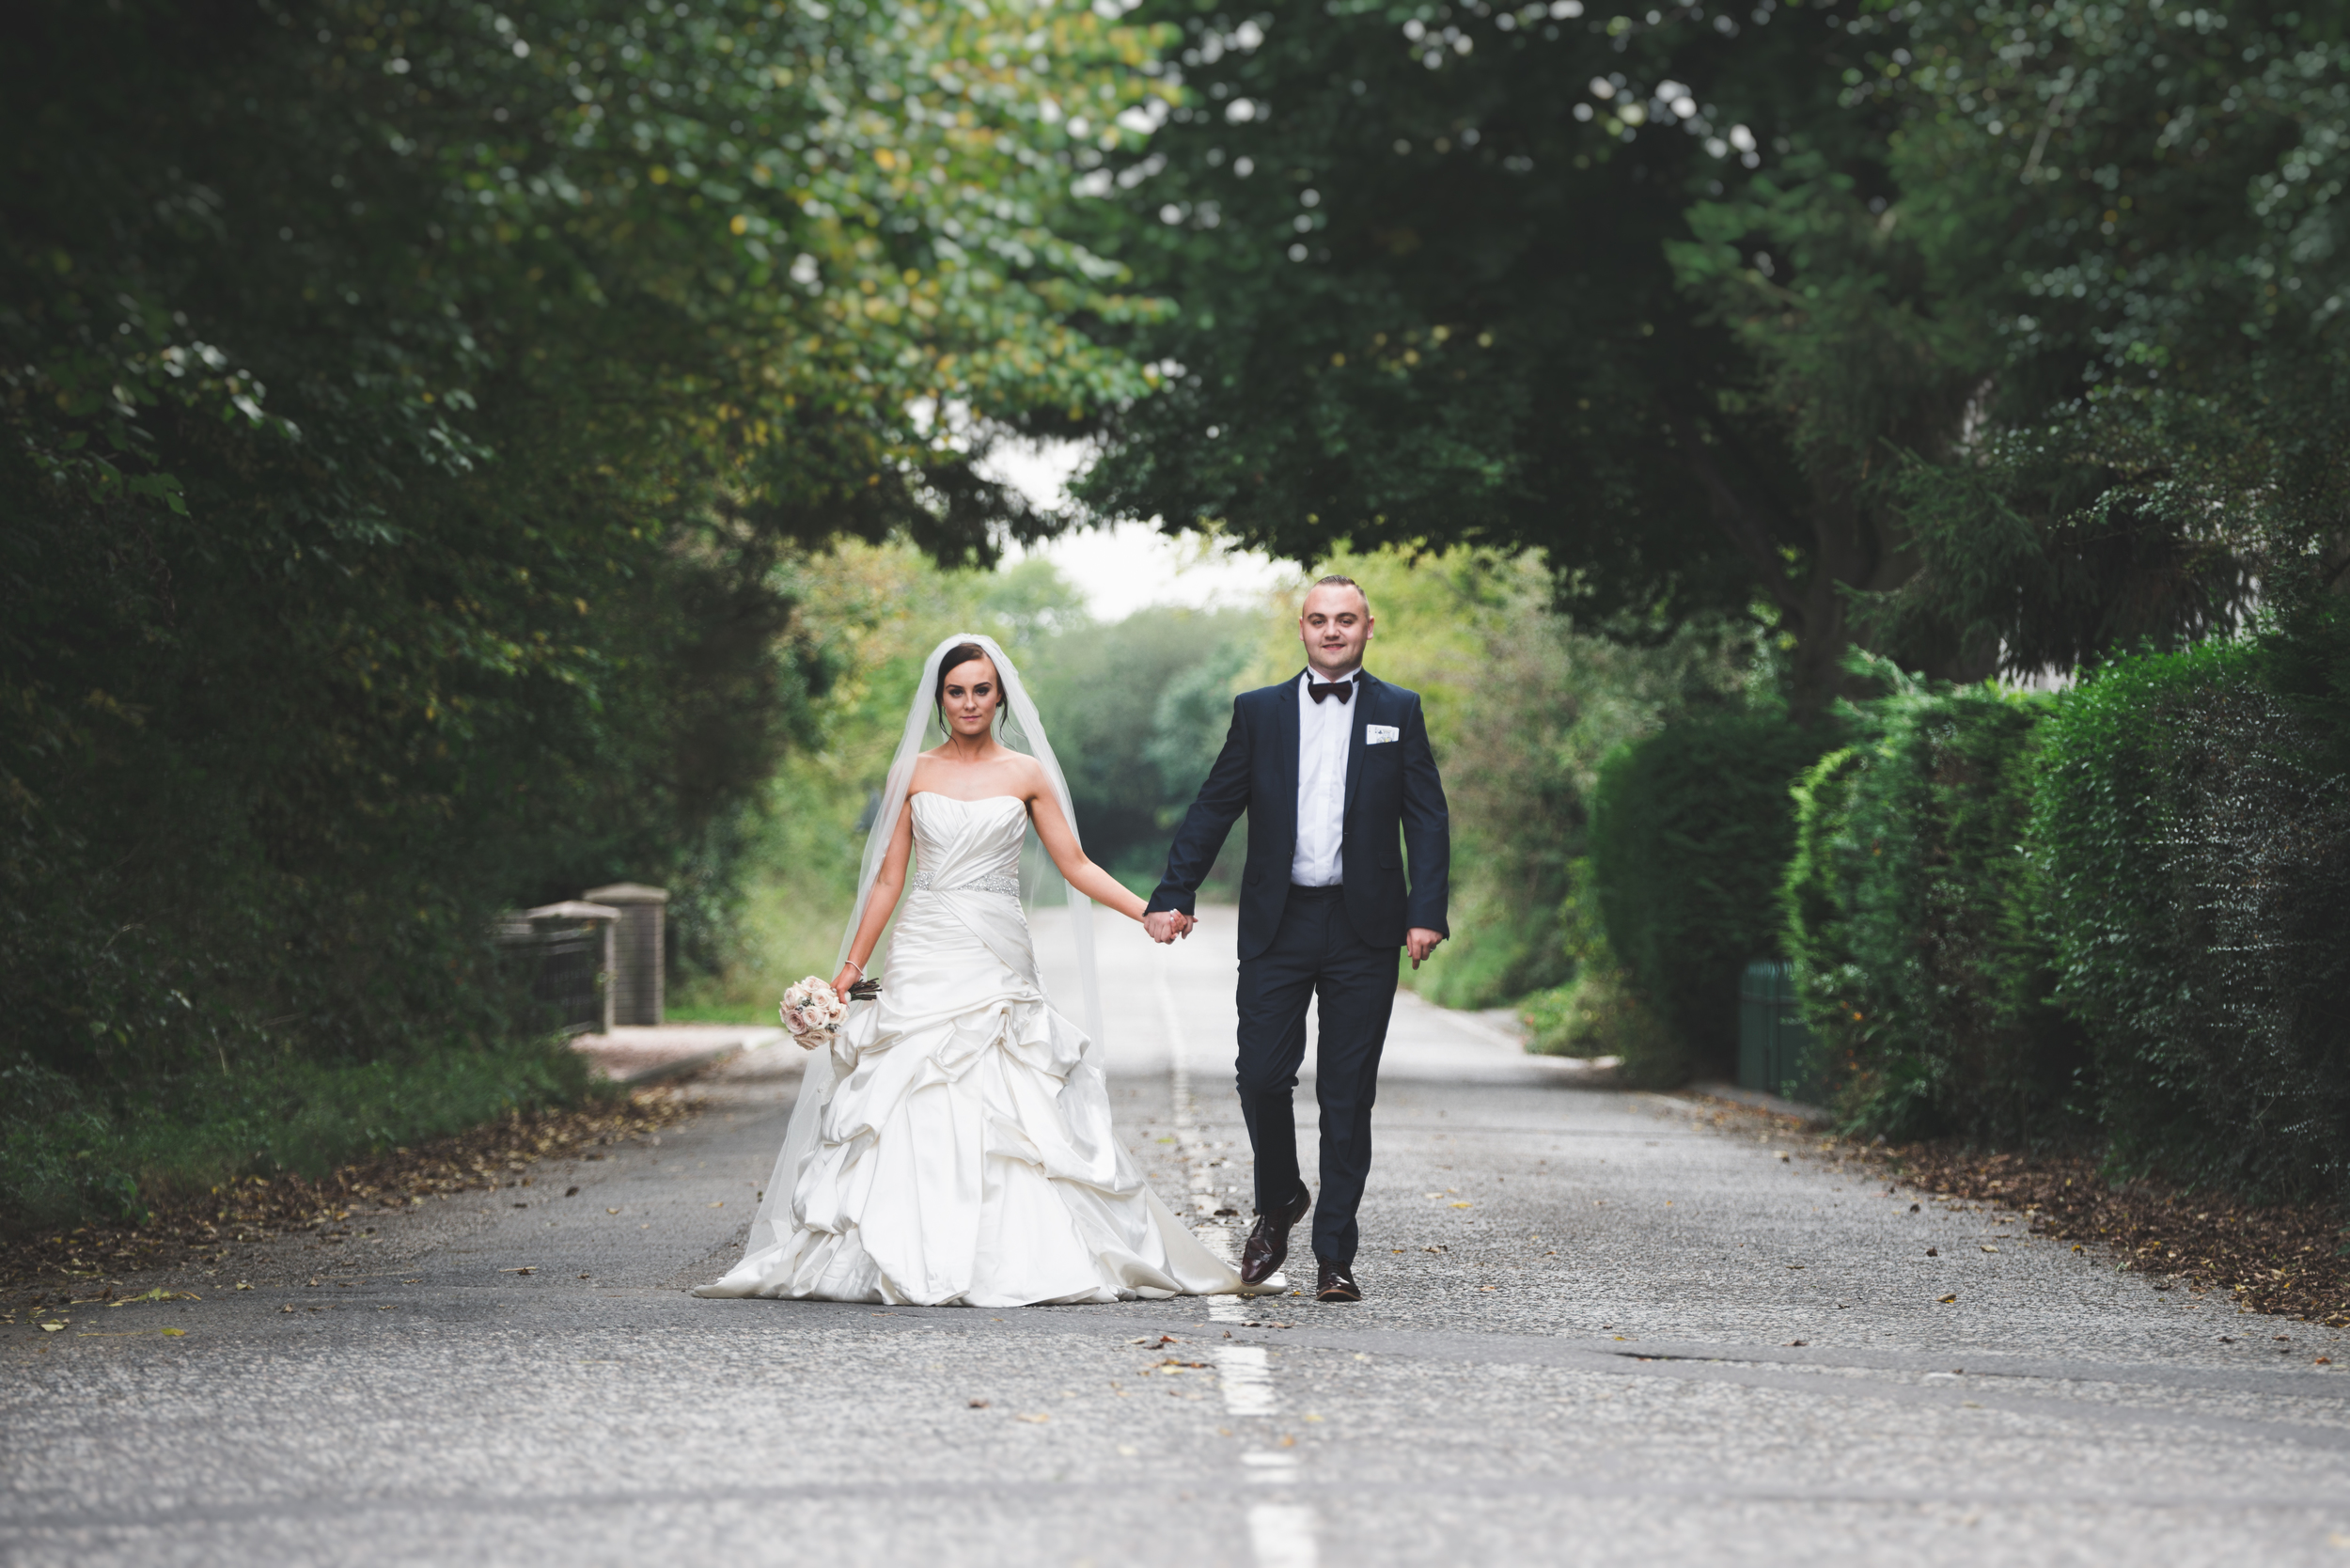 Northern_Ireland_Wedding_Photographer_Purephotoni_Dunsilly_Hotel_Wedding_Bride_Groom_Portrait